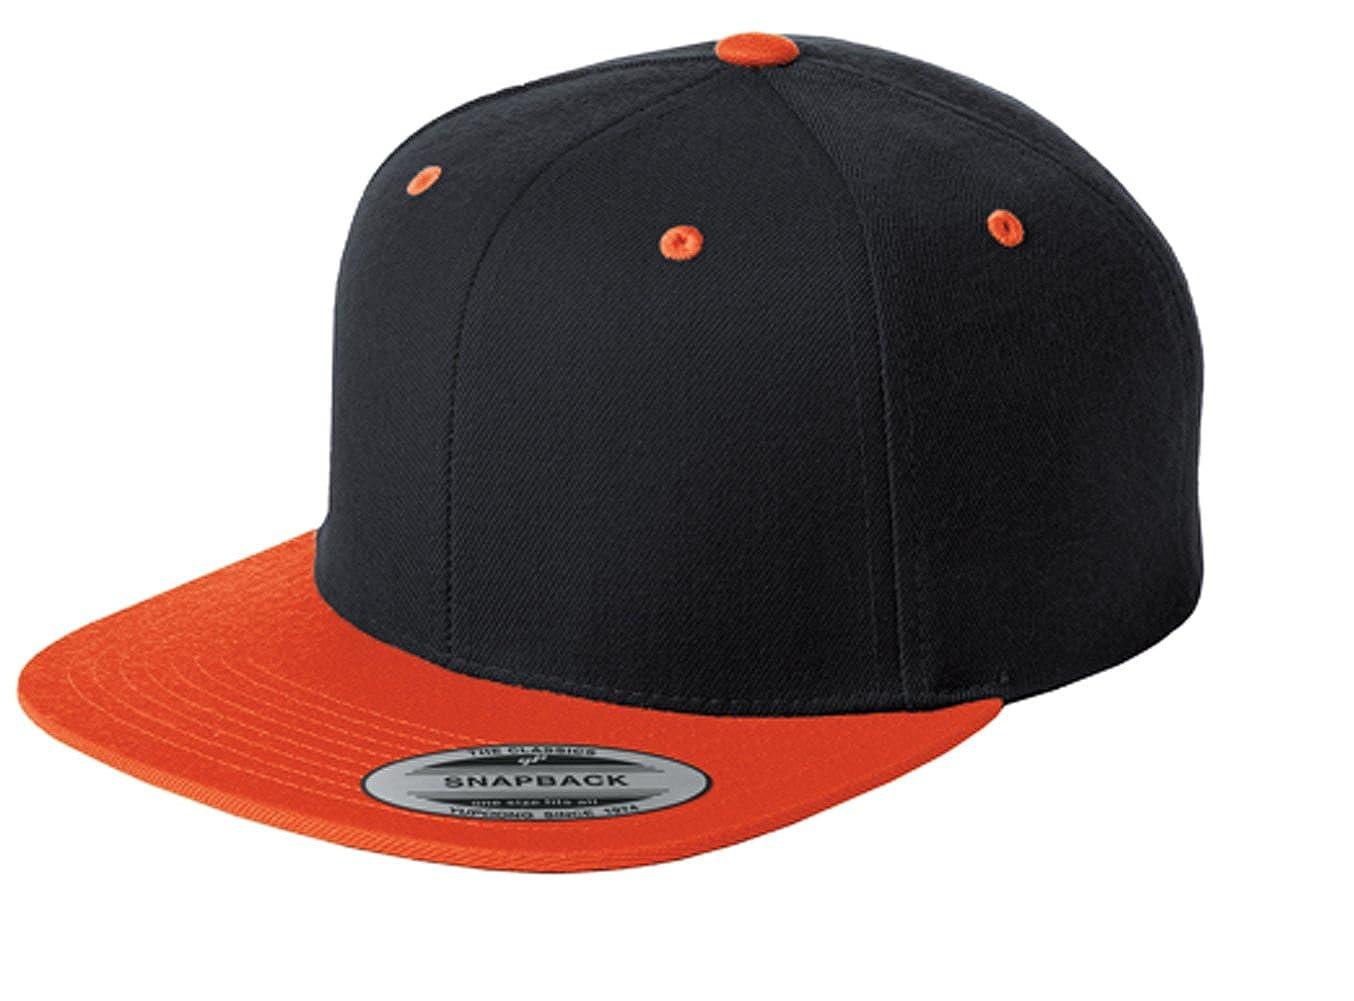 8b2045fb557 Sport-Tek Men s Flat Bill Snapback Cap